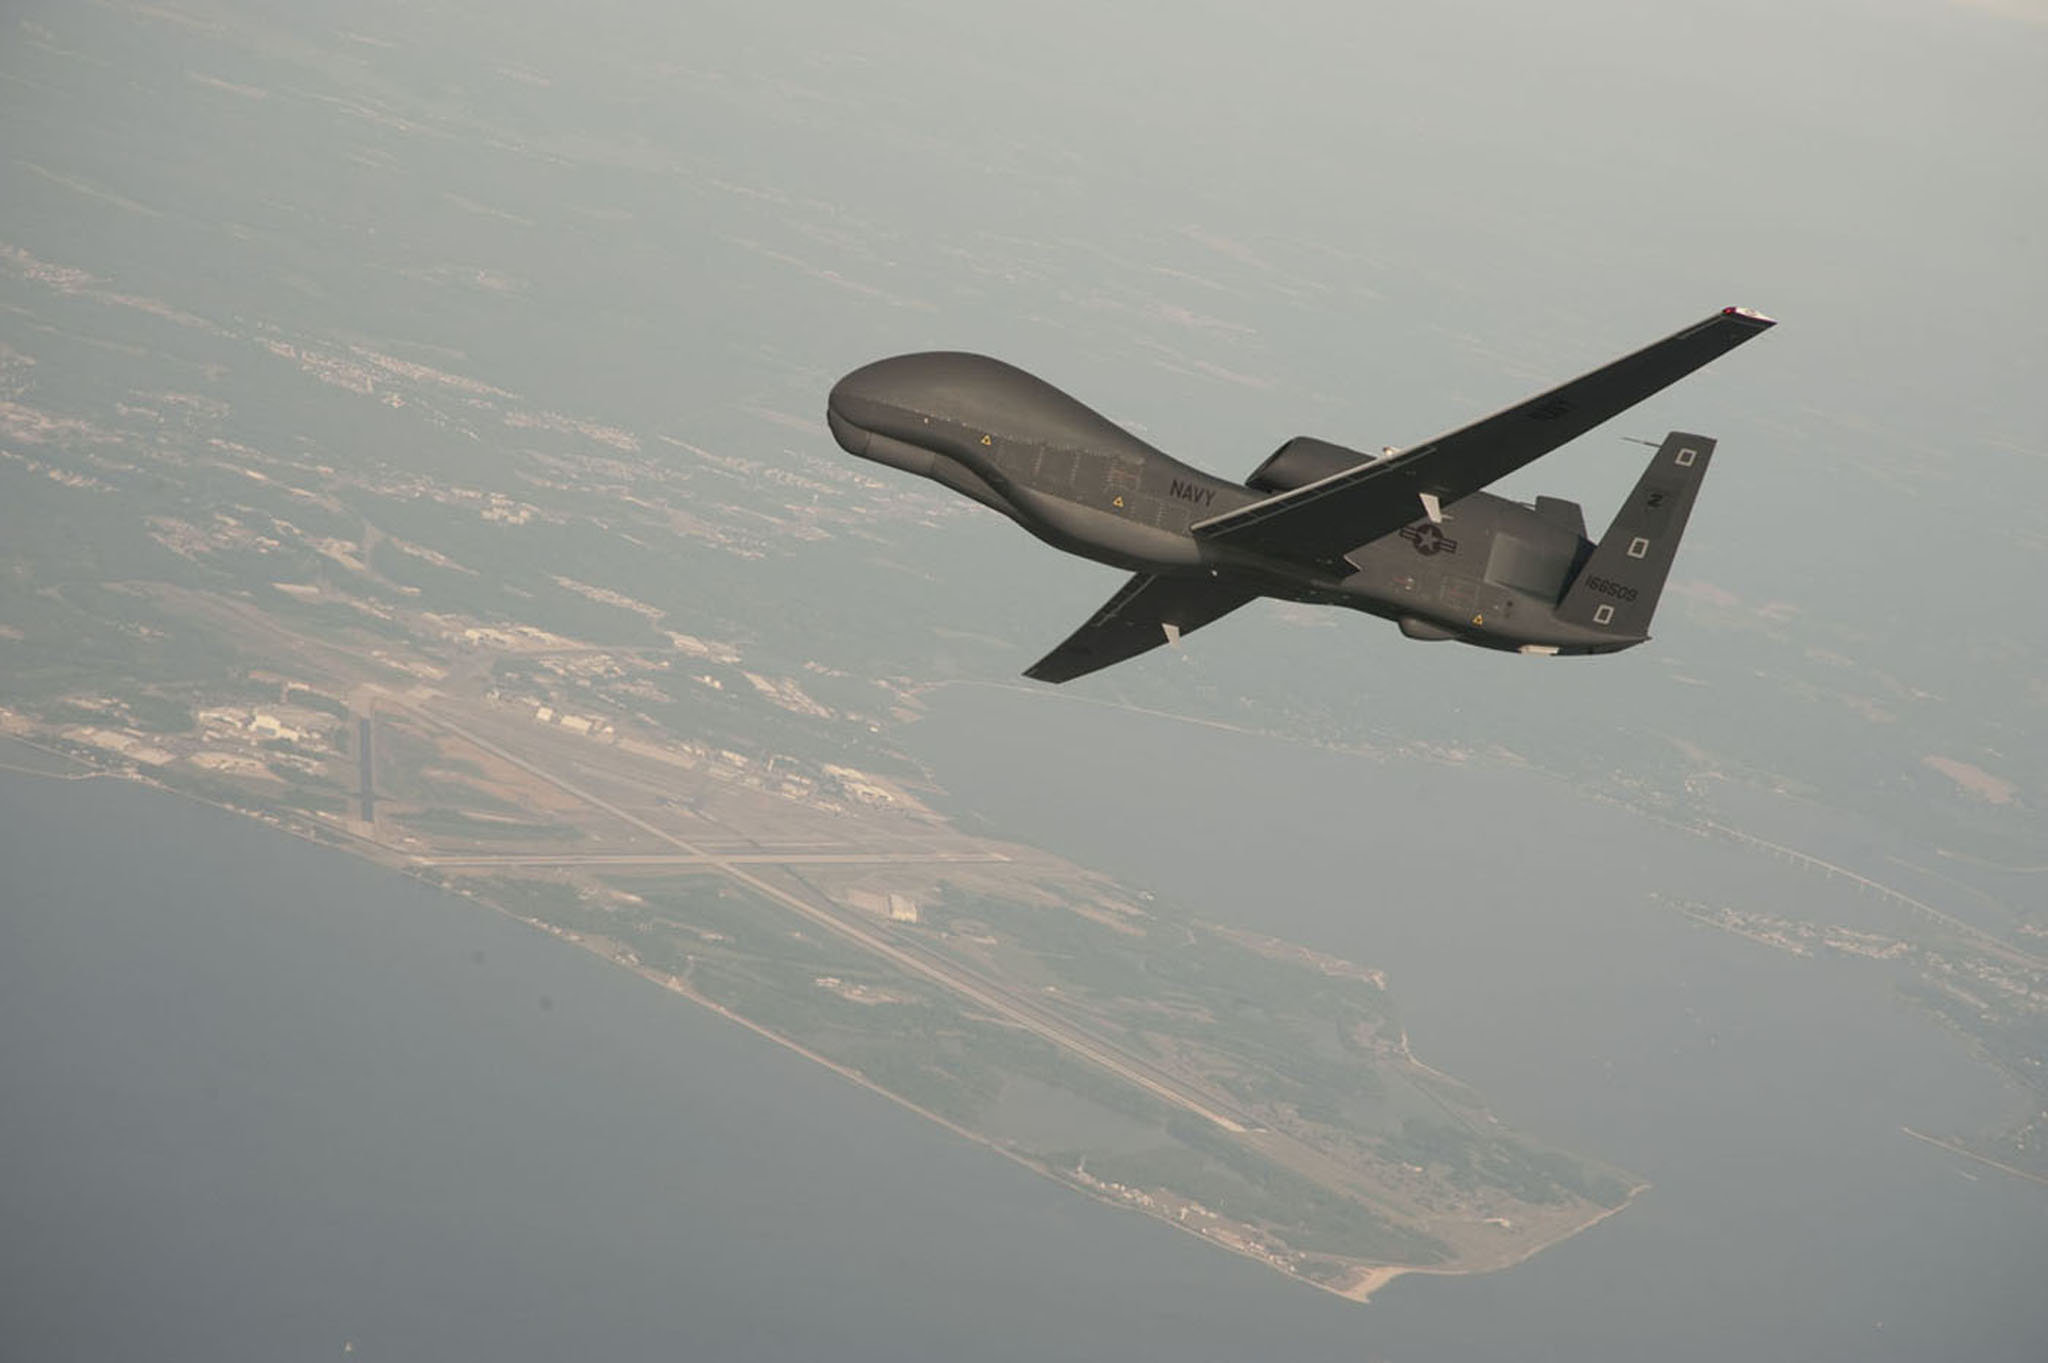 A drone test flight over Naval Air Station Patuxent River, Maryland, in 2010. Credit Erik Hildebrandt/EPA, via Shutterstock